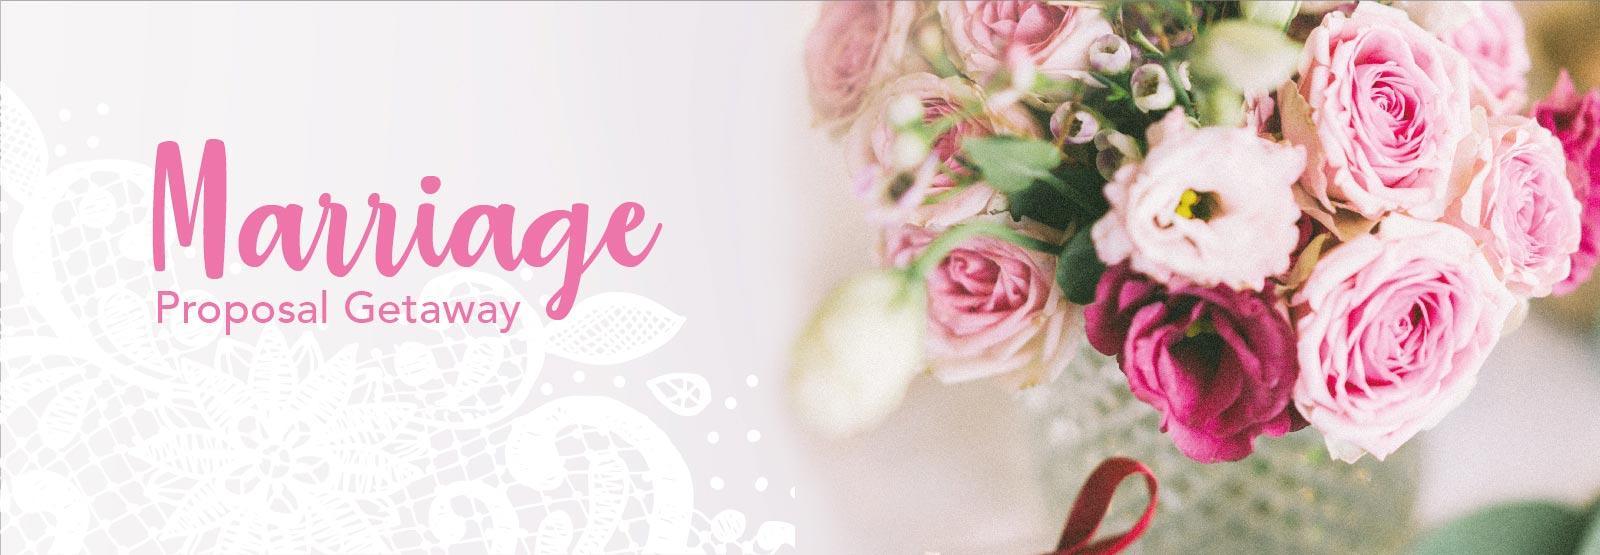 Wedding Proposal Malaysia | Berjaya KL Marriage Proposal Getaway